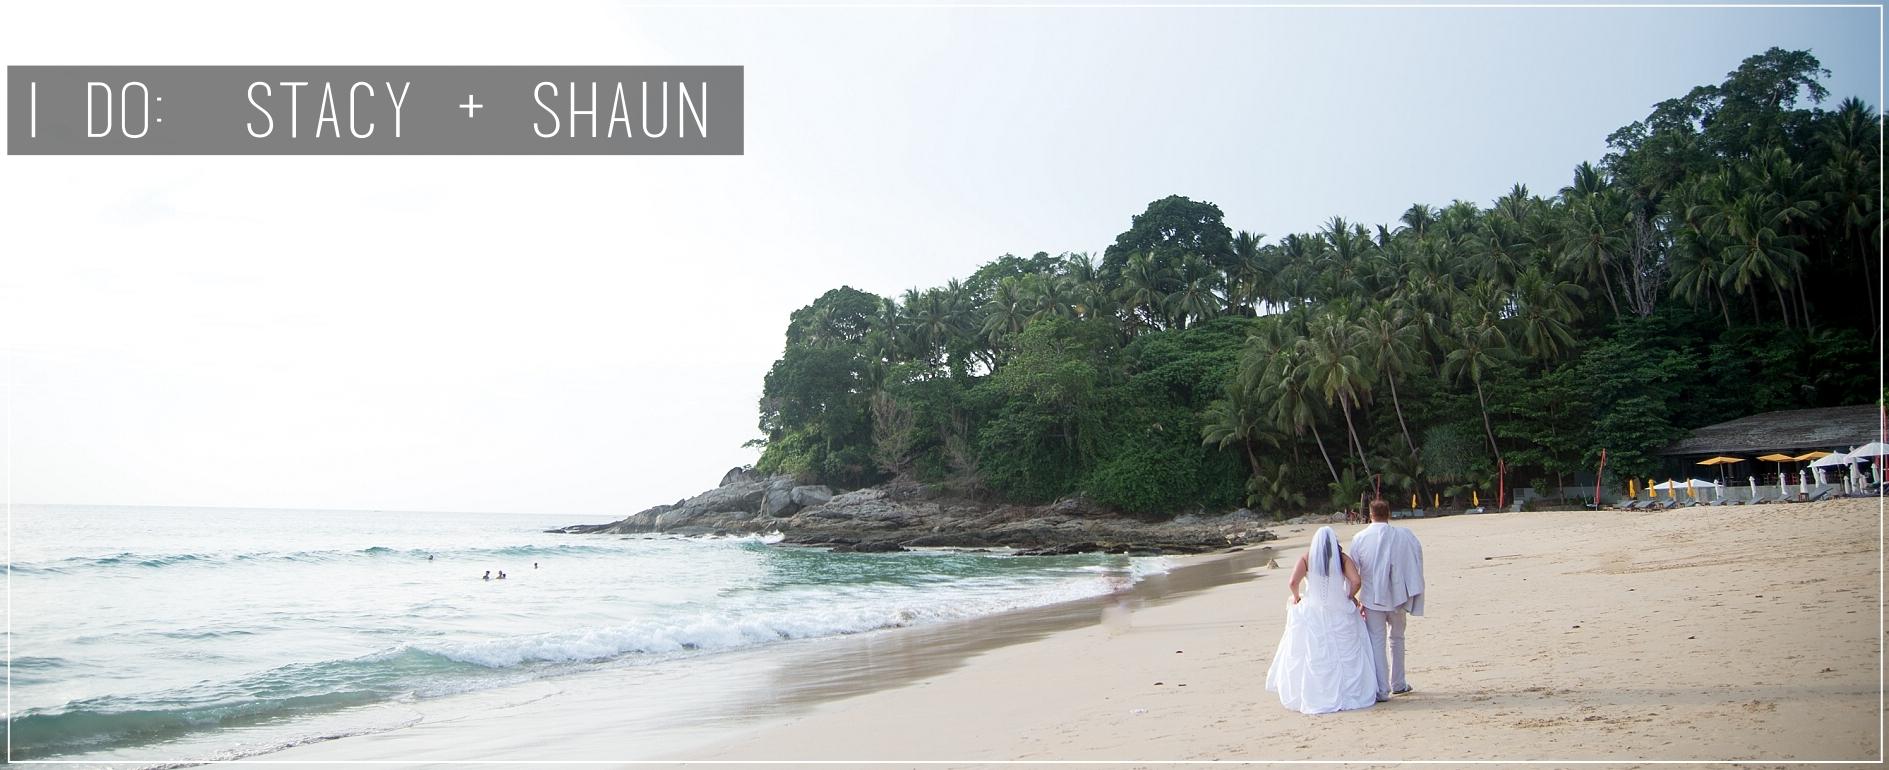 Darren Bester Photography - Cape Town Wedding Photographer - Destination Wedding - Thailand - Stacy and Shaun_0001.jpg